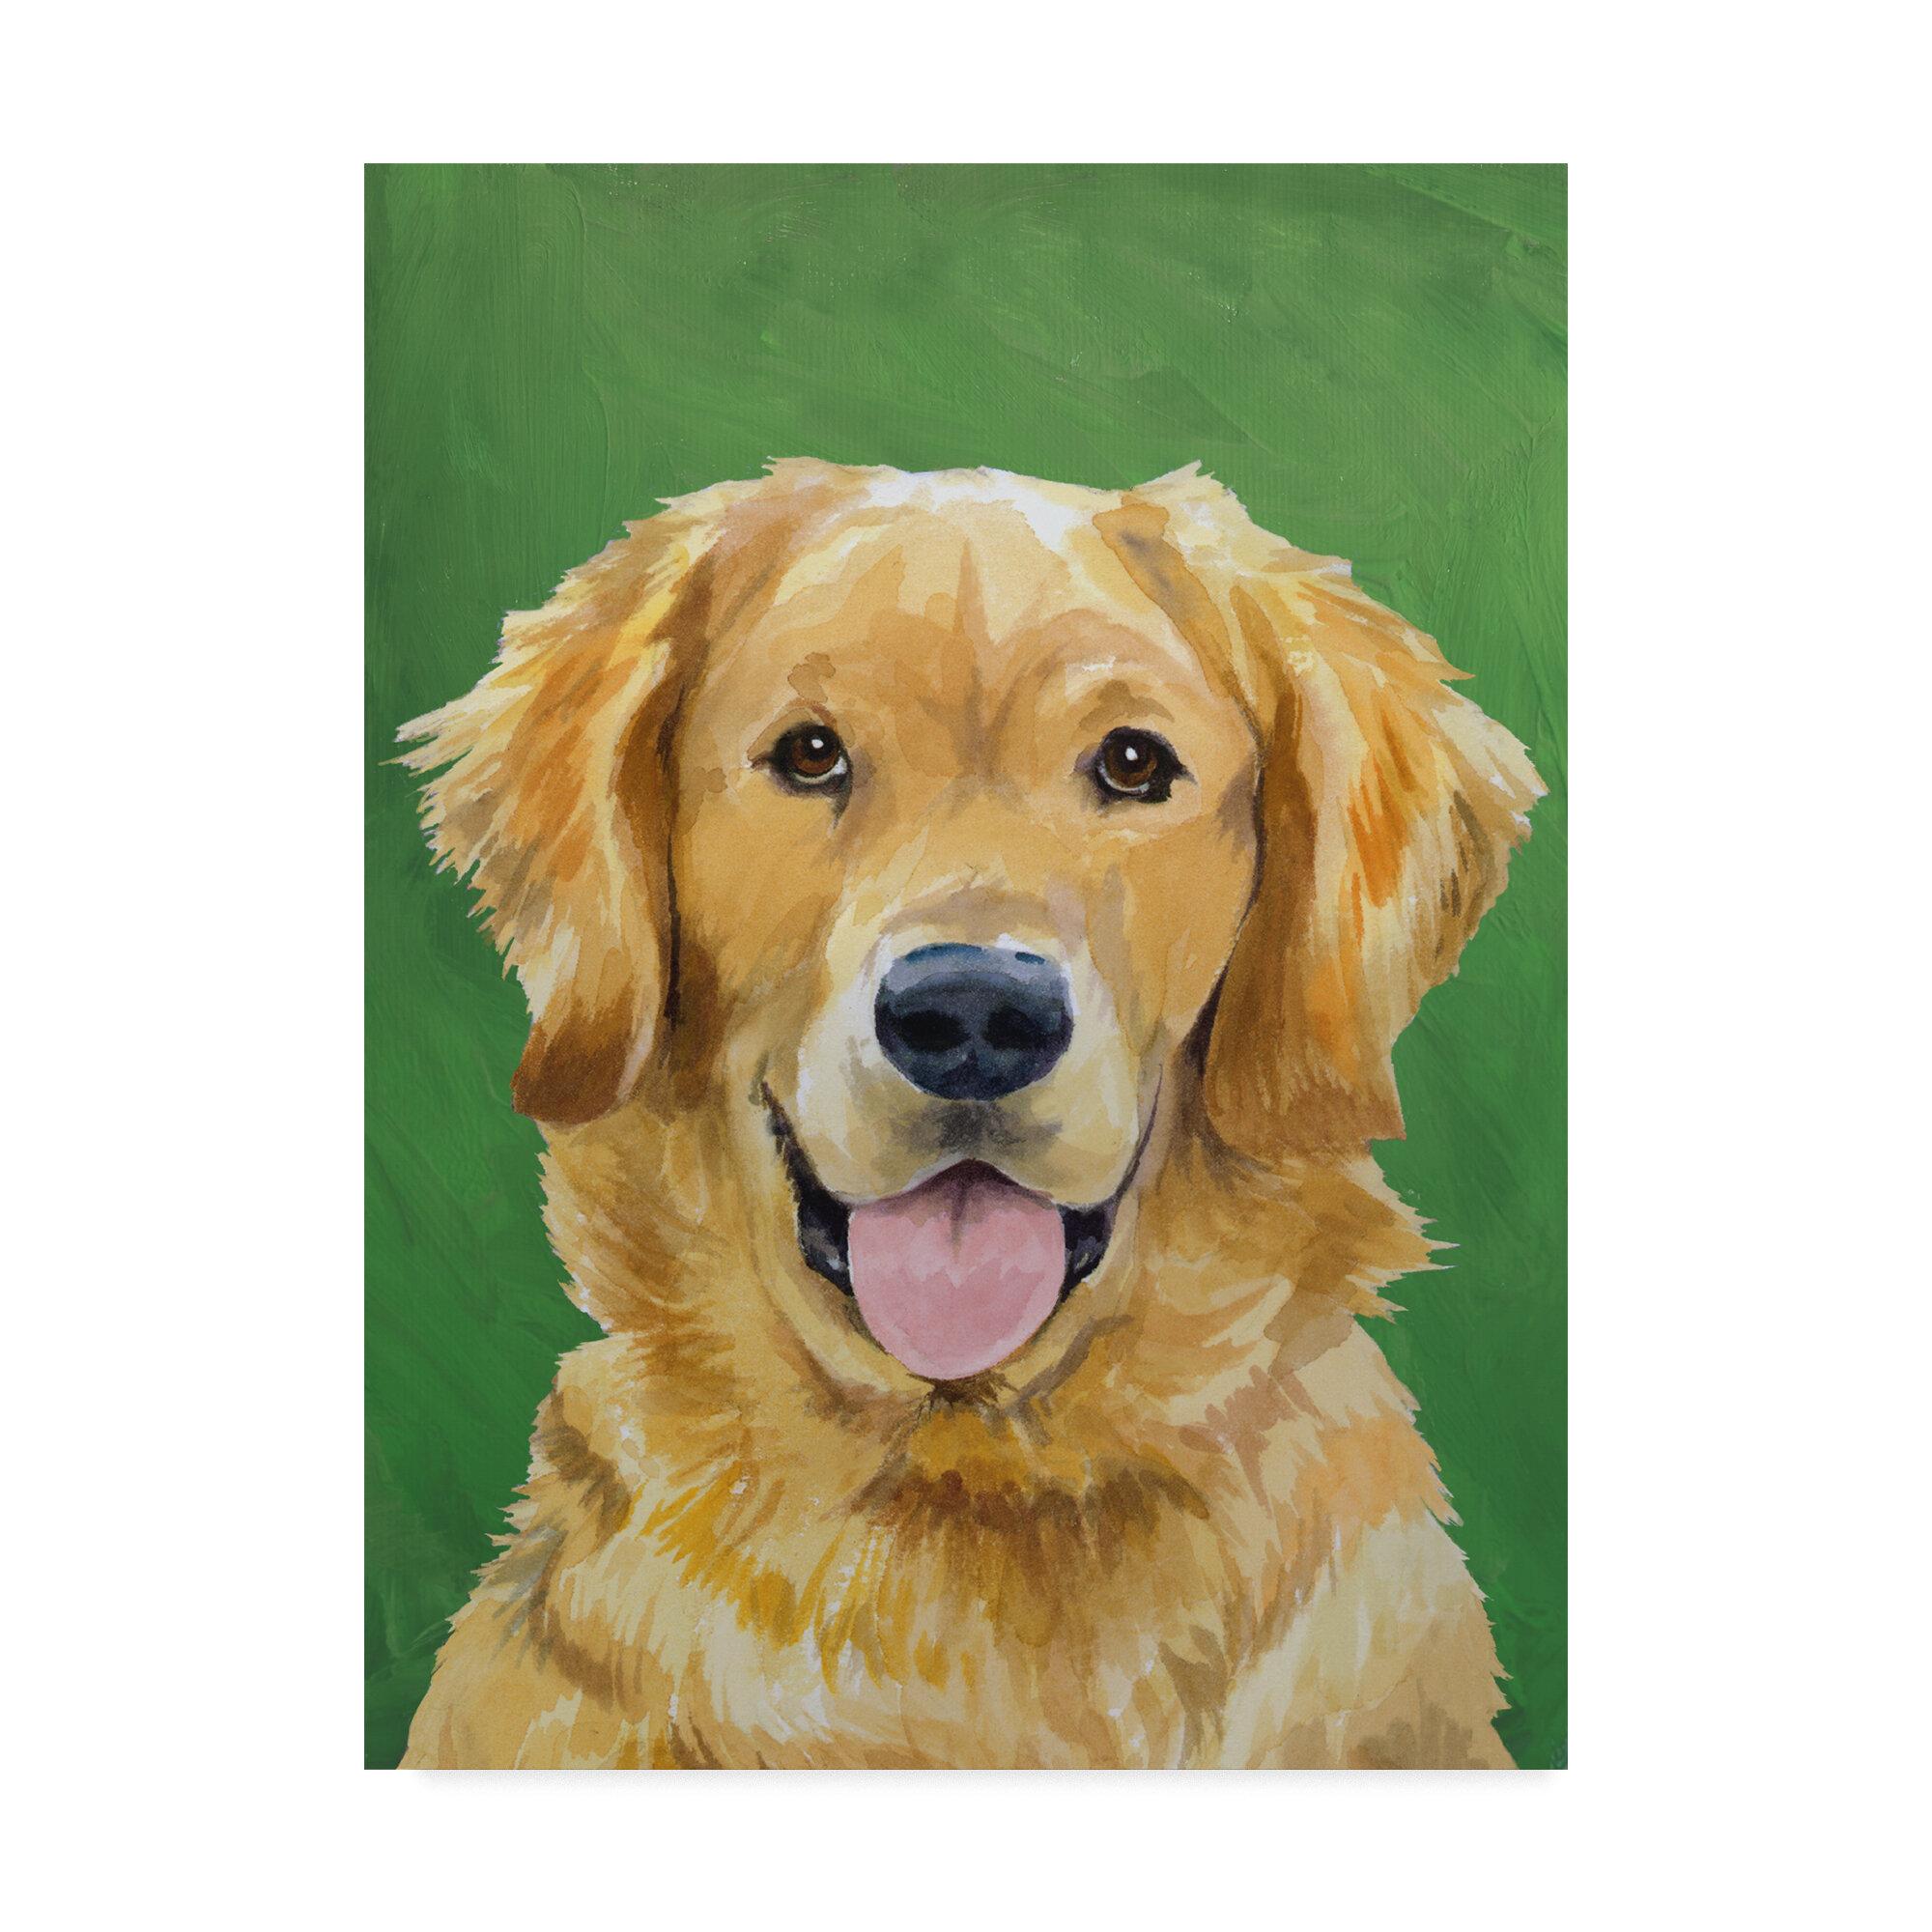 painted dog dog ceramic tile dog tile dog art yellow labrador golden retriever